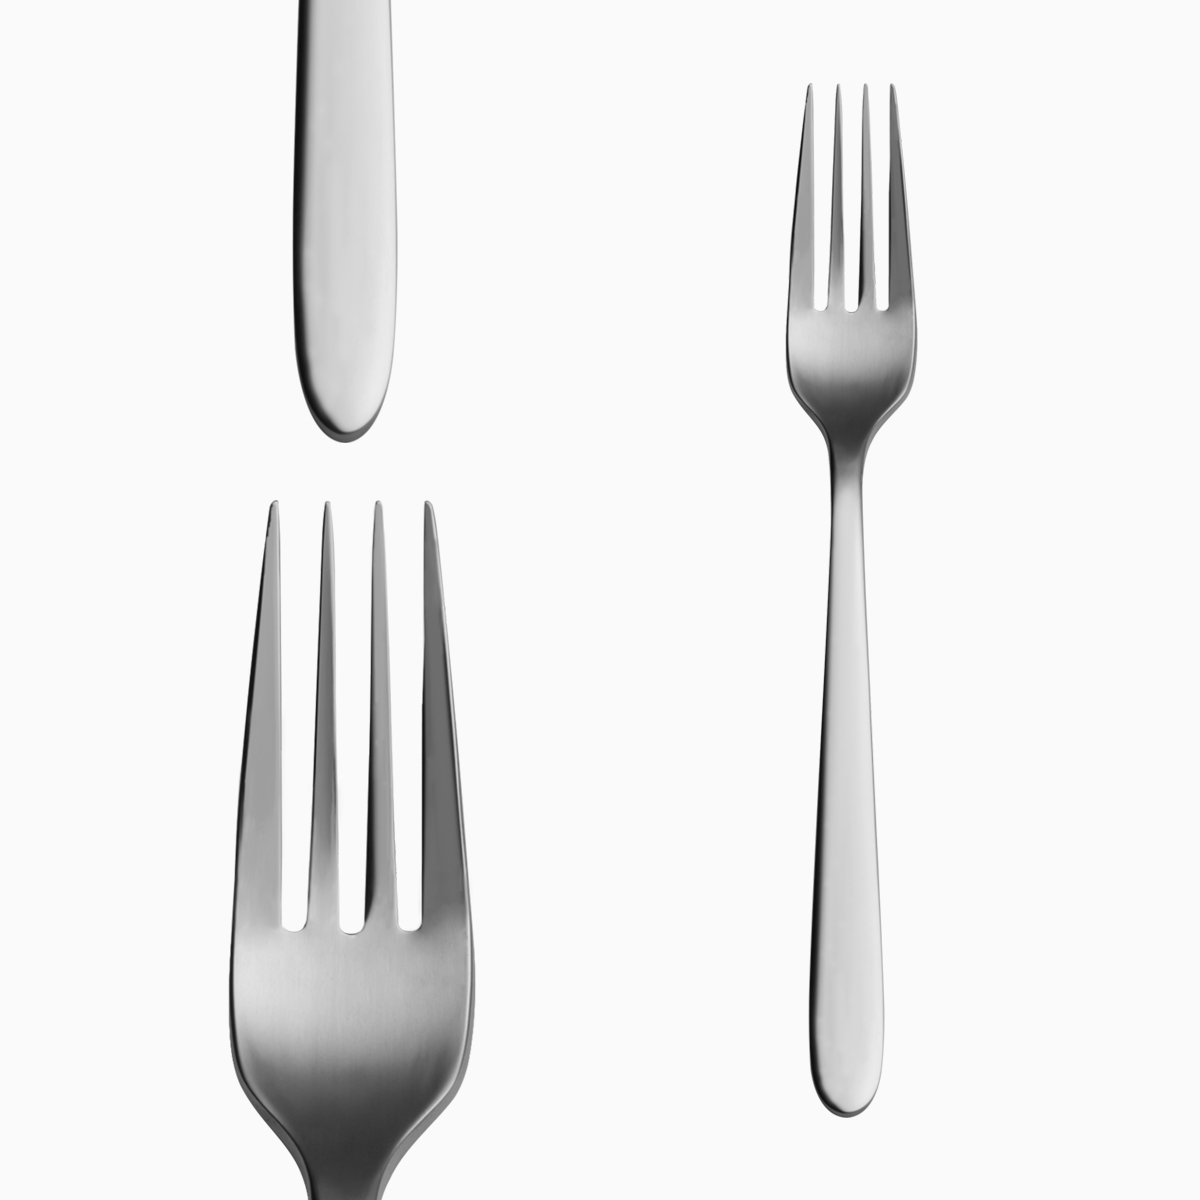 Table fork - Callisto CR